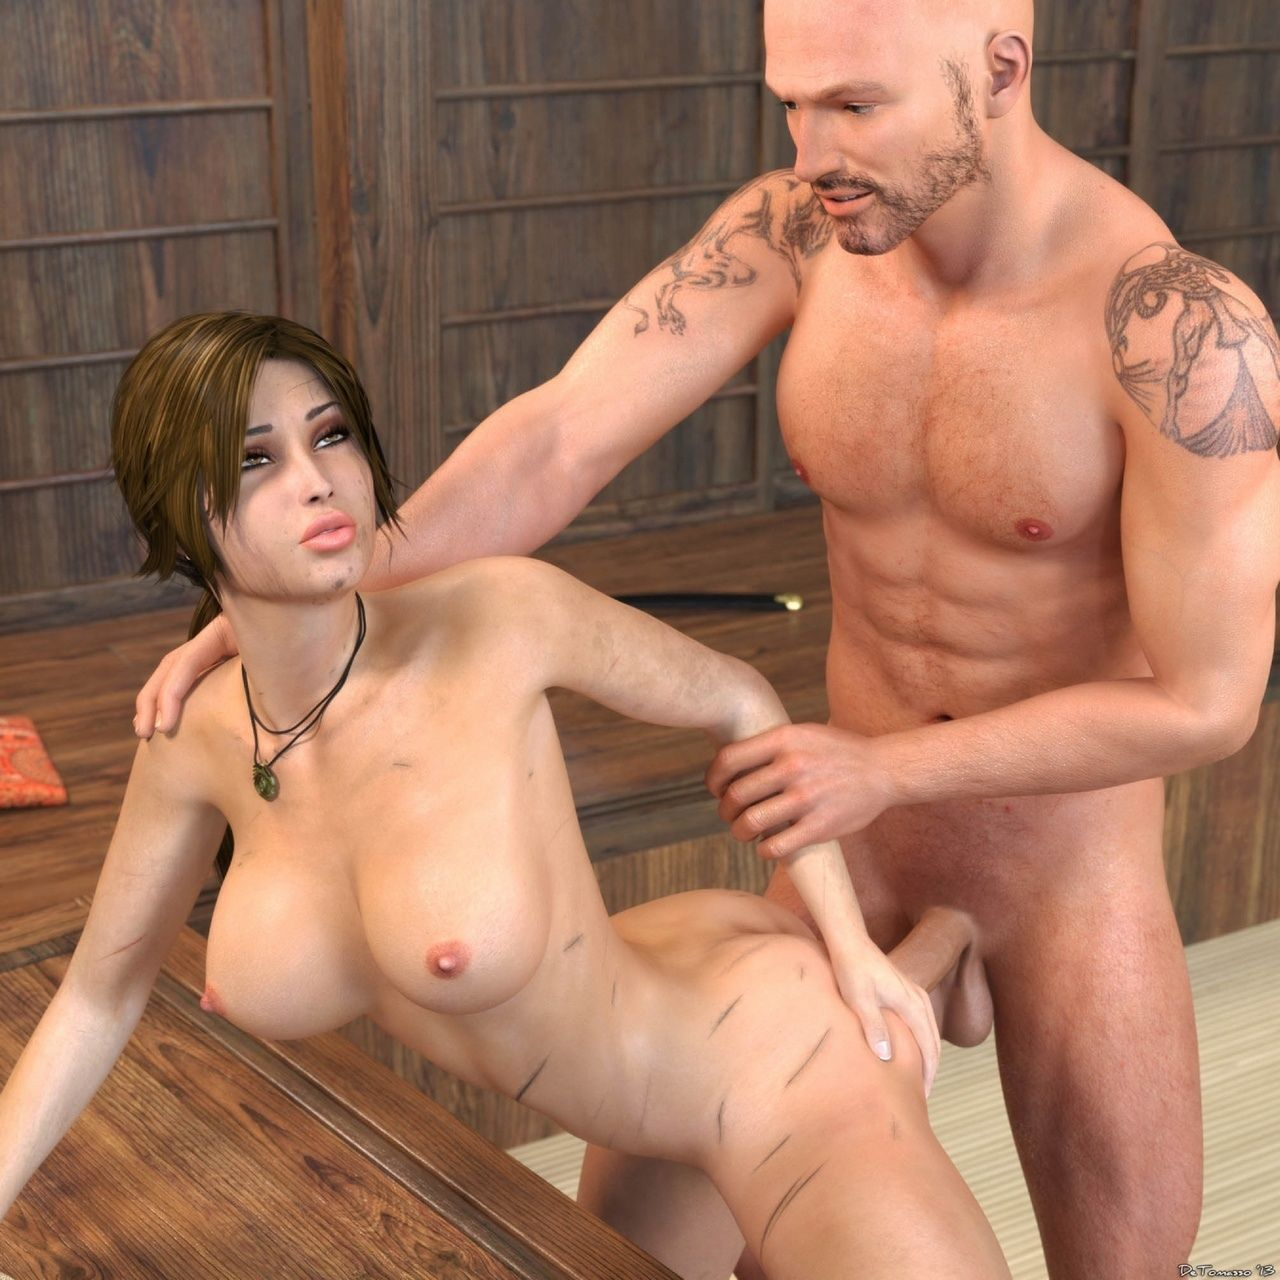 Adult Sexgames